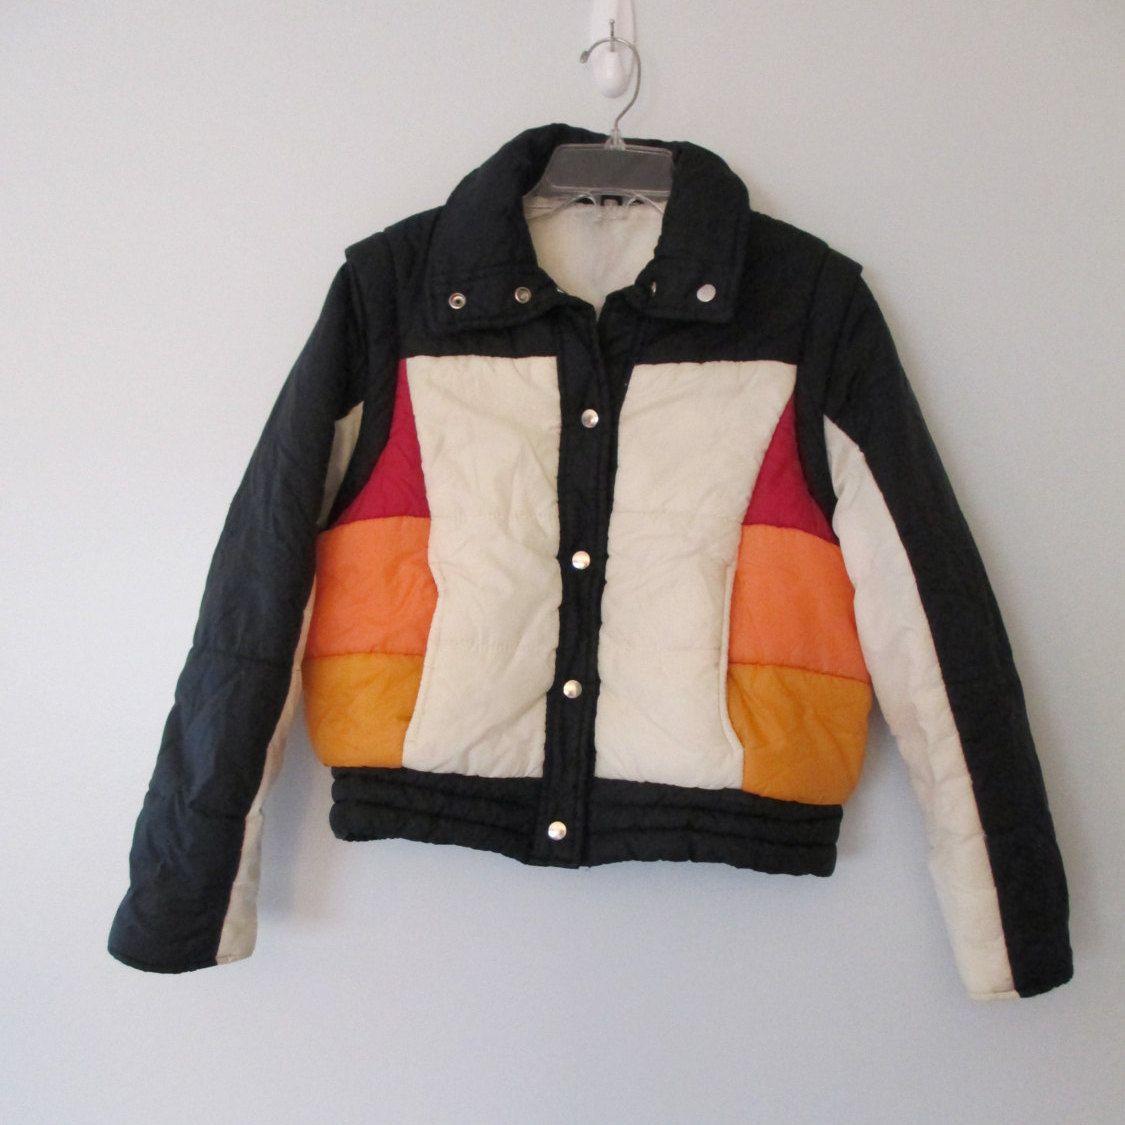 Vintage 70s Puffer Ski Jacket Convertible Vest Women S By Waywevintage On Etsy Ski Jacket Womens Vest Fashion [ 1125 x 1125 Pixel ]